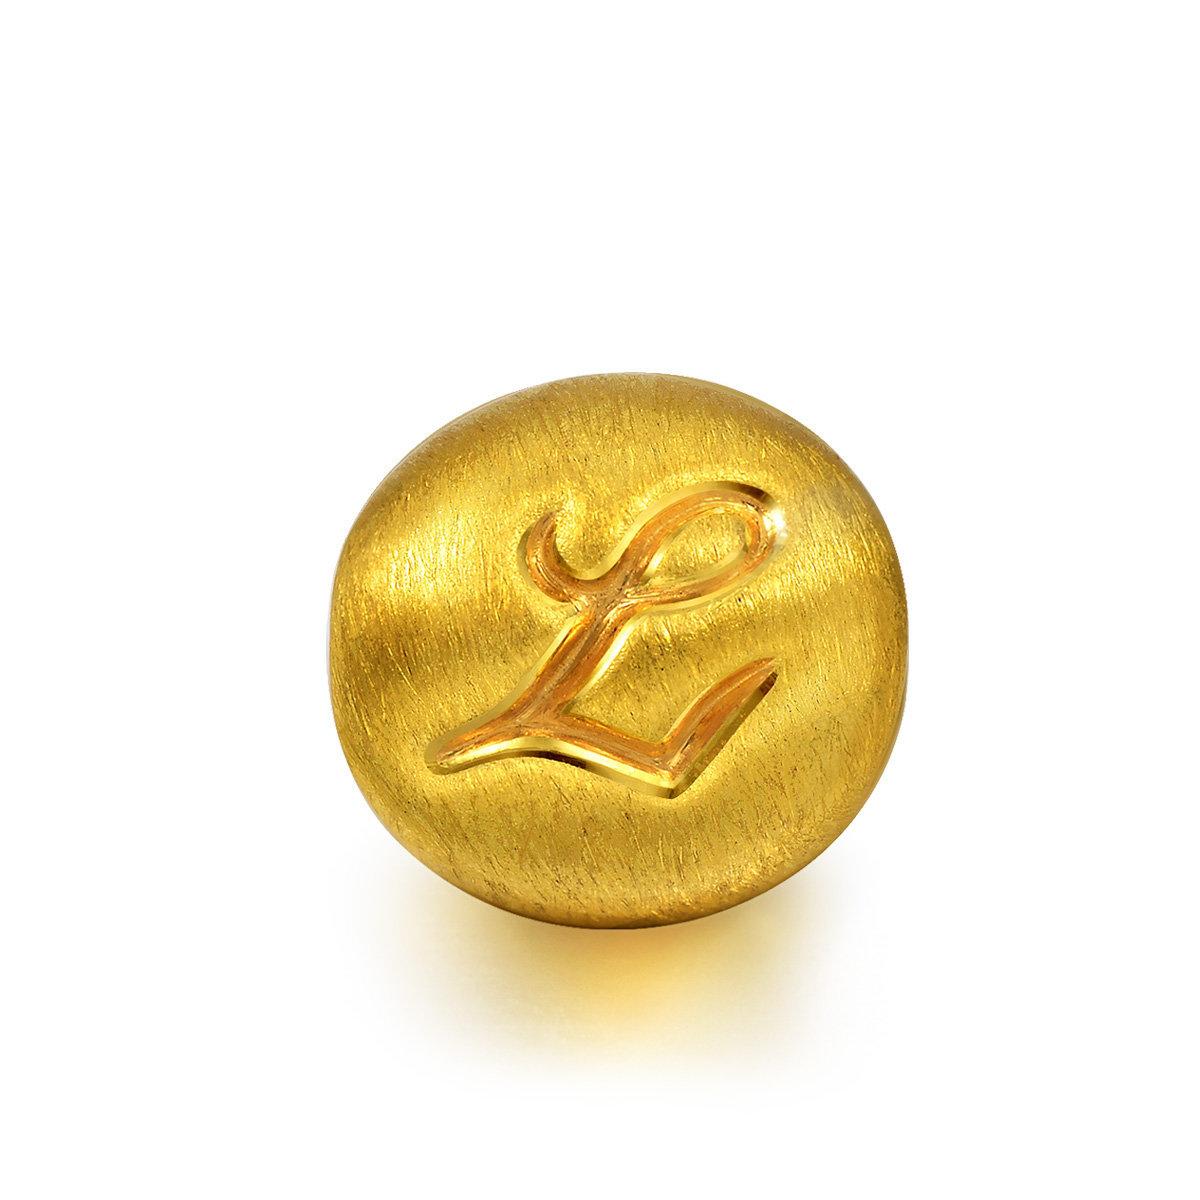 Charme 'Alphabets' 999 Gold Letter L Charm (Bracelet not included)